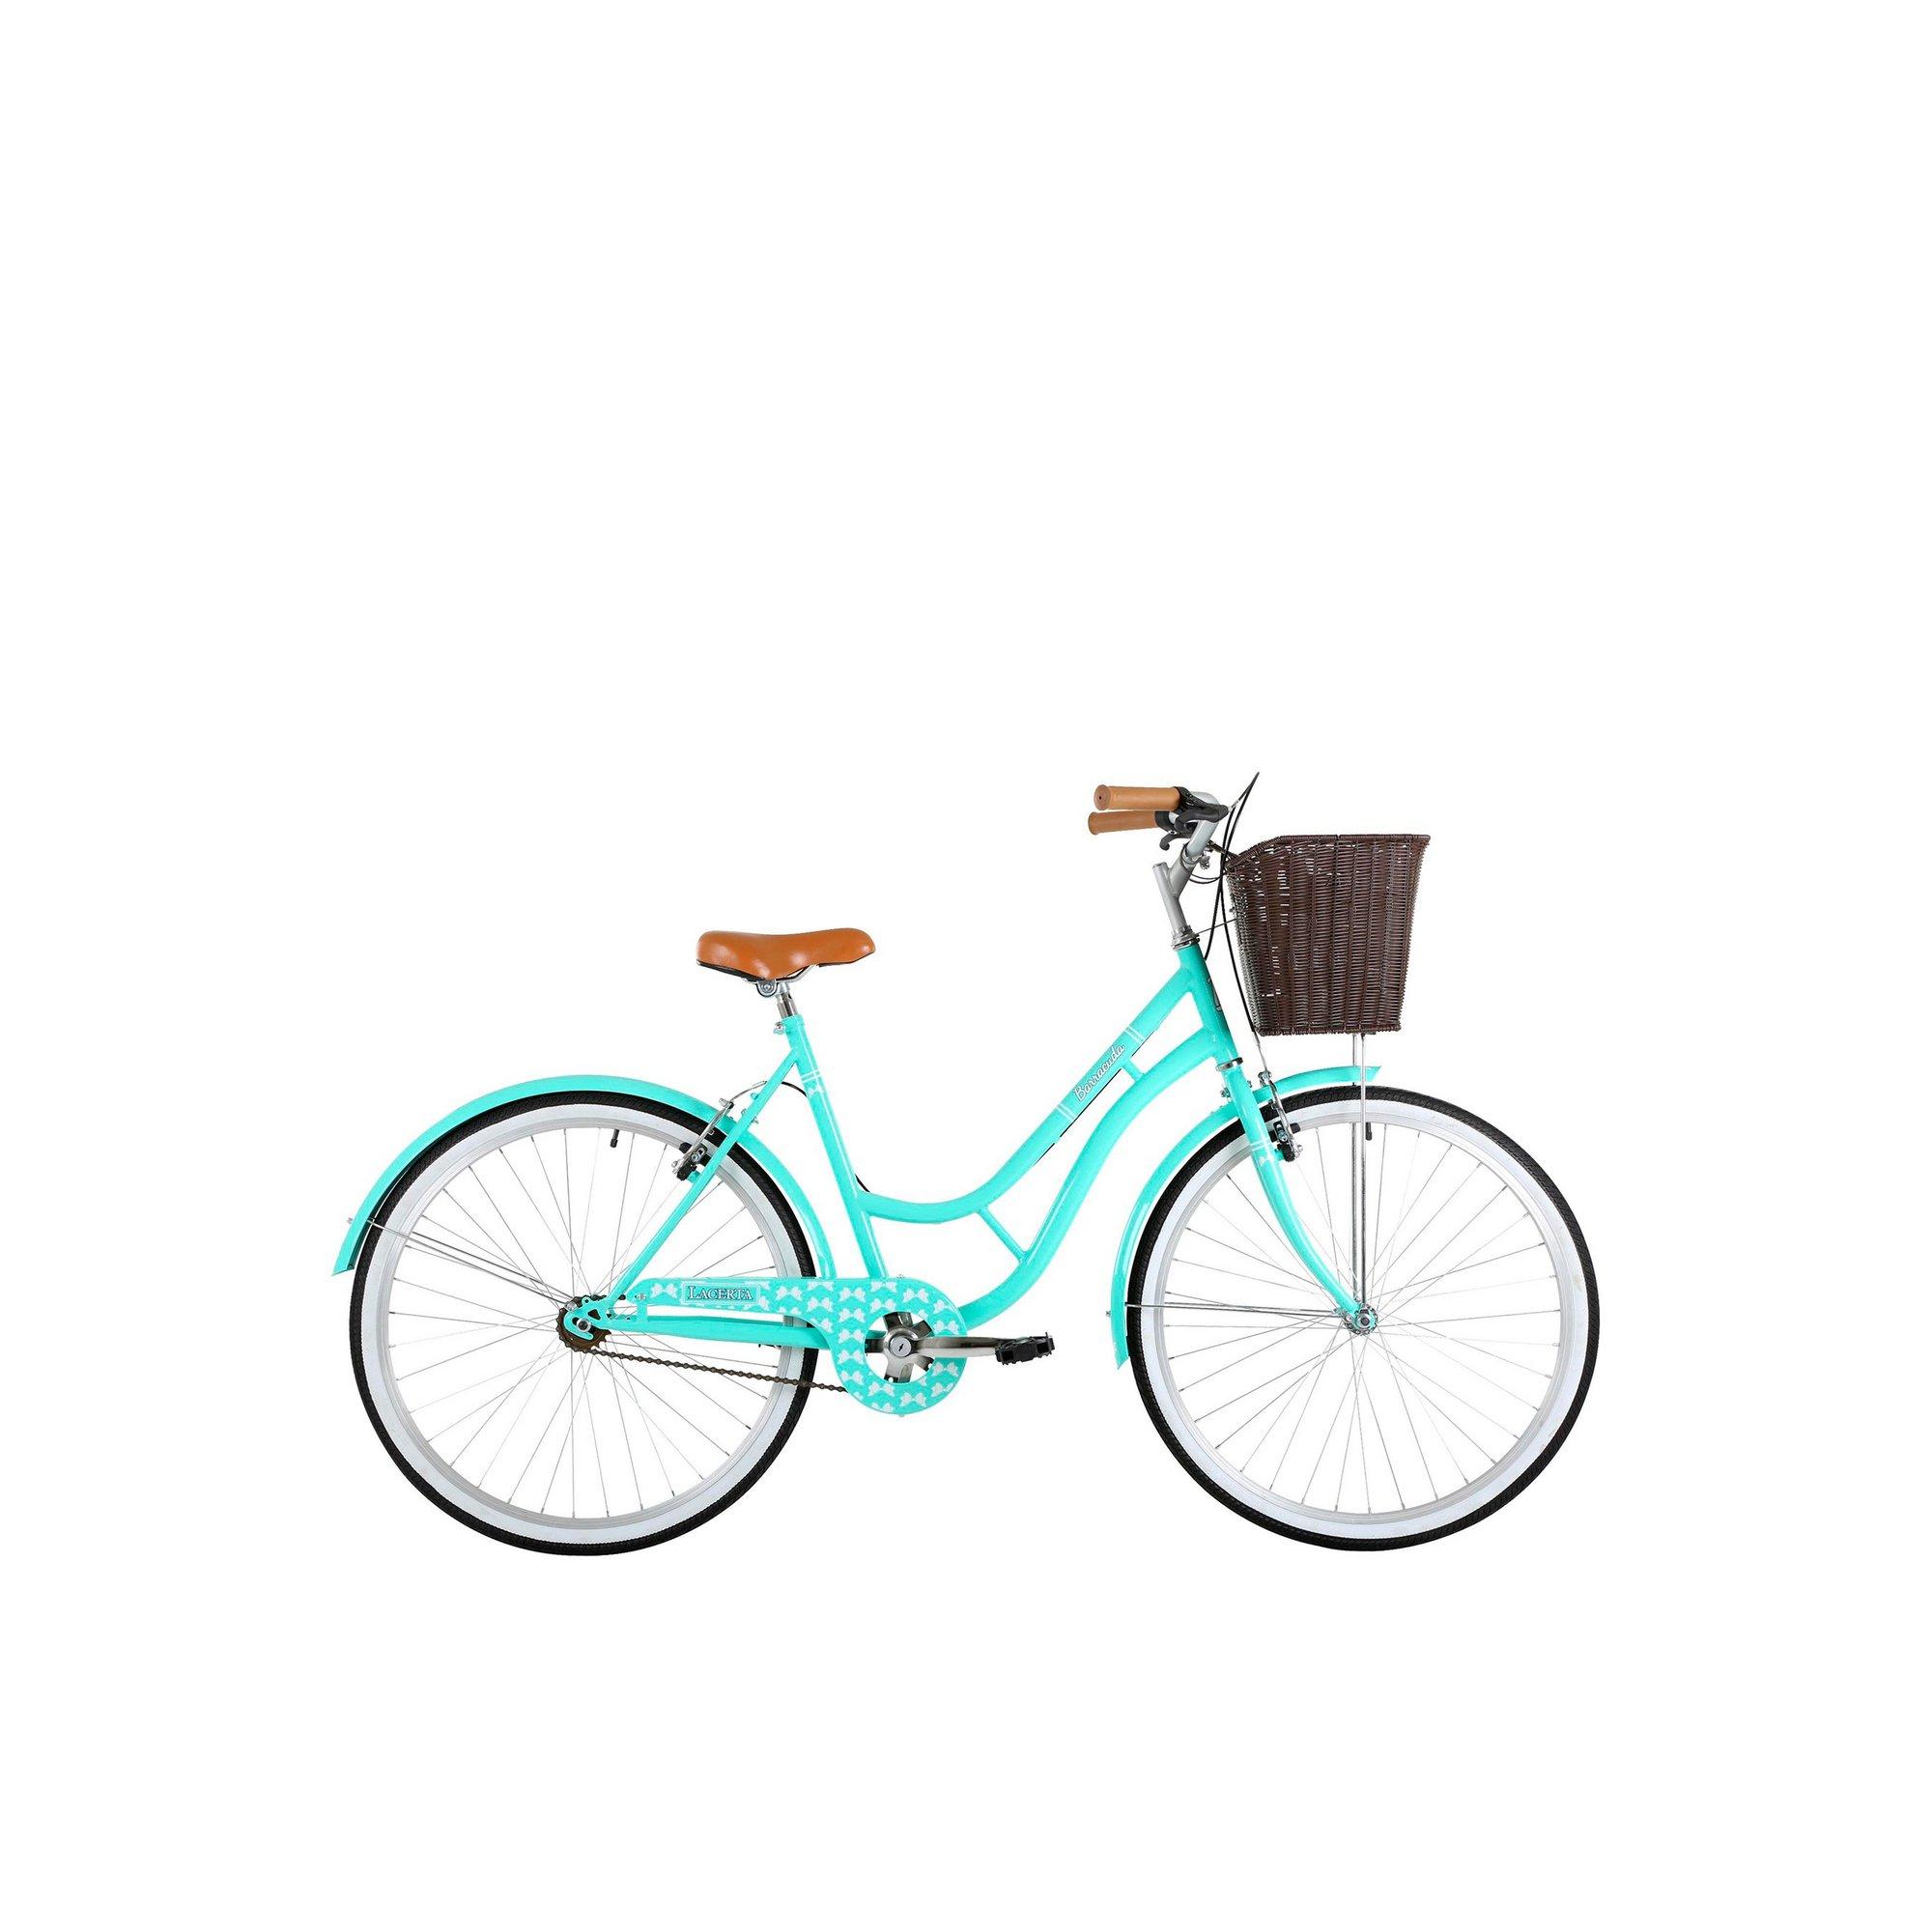 Image of Barracuda Lacerta Single Speed Bike